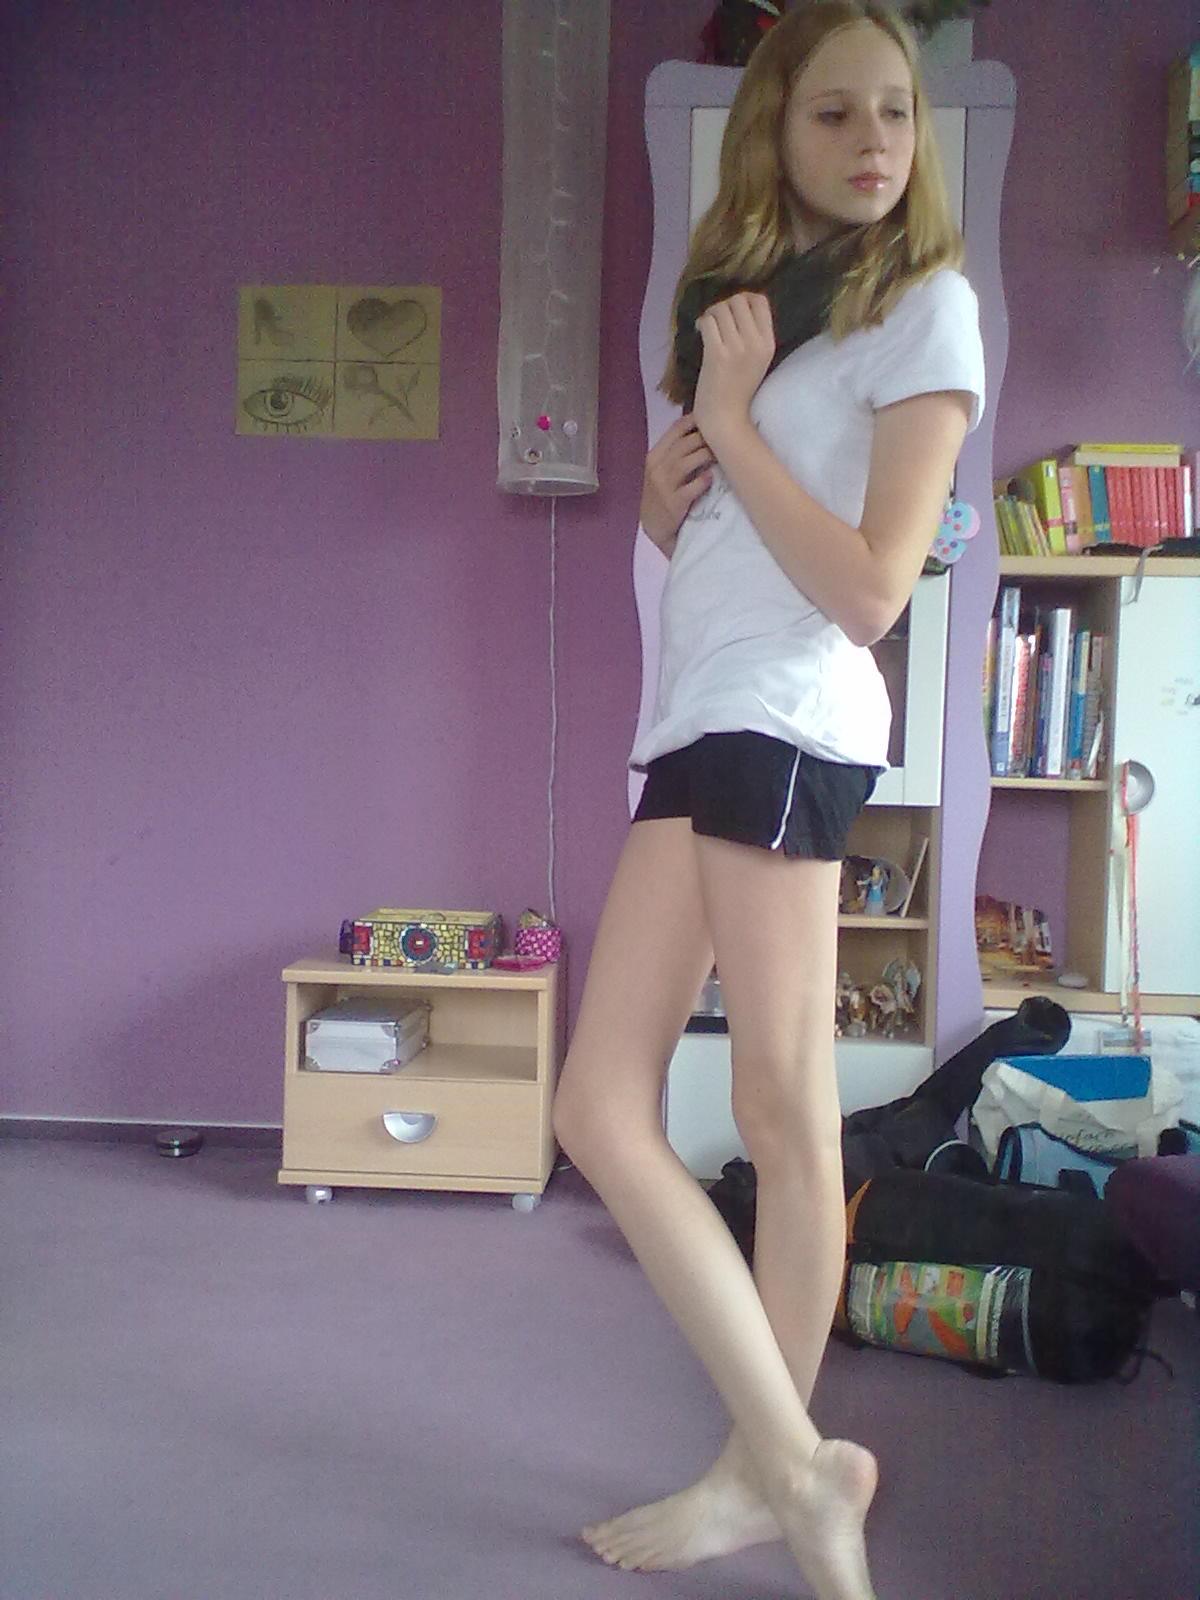 bullied ♡: Juni 2012